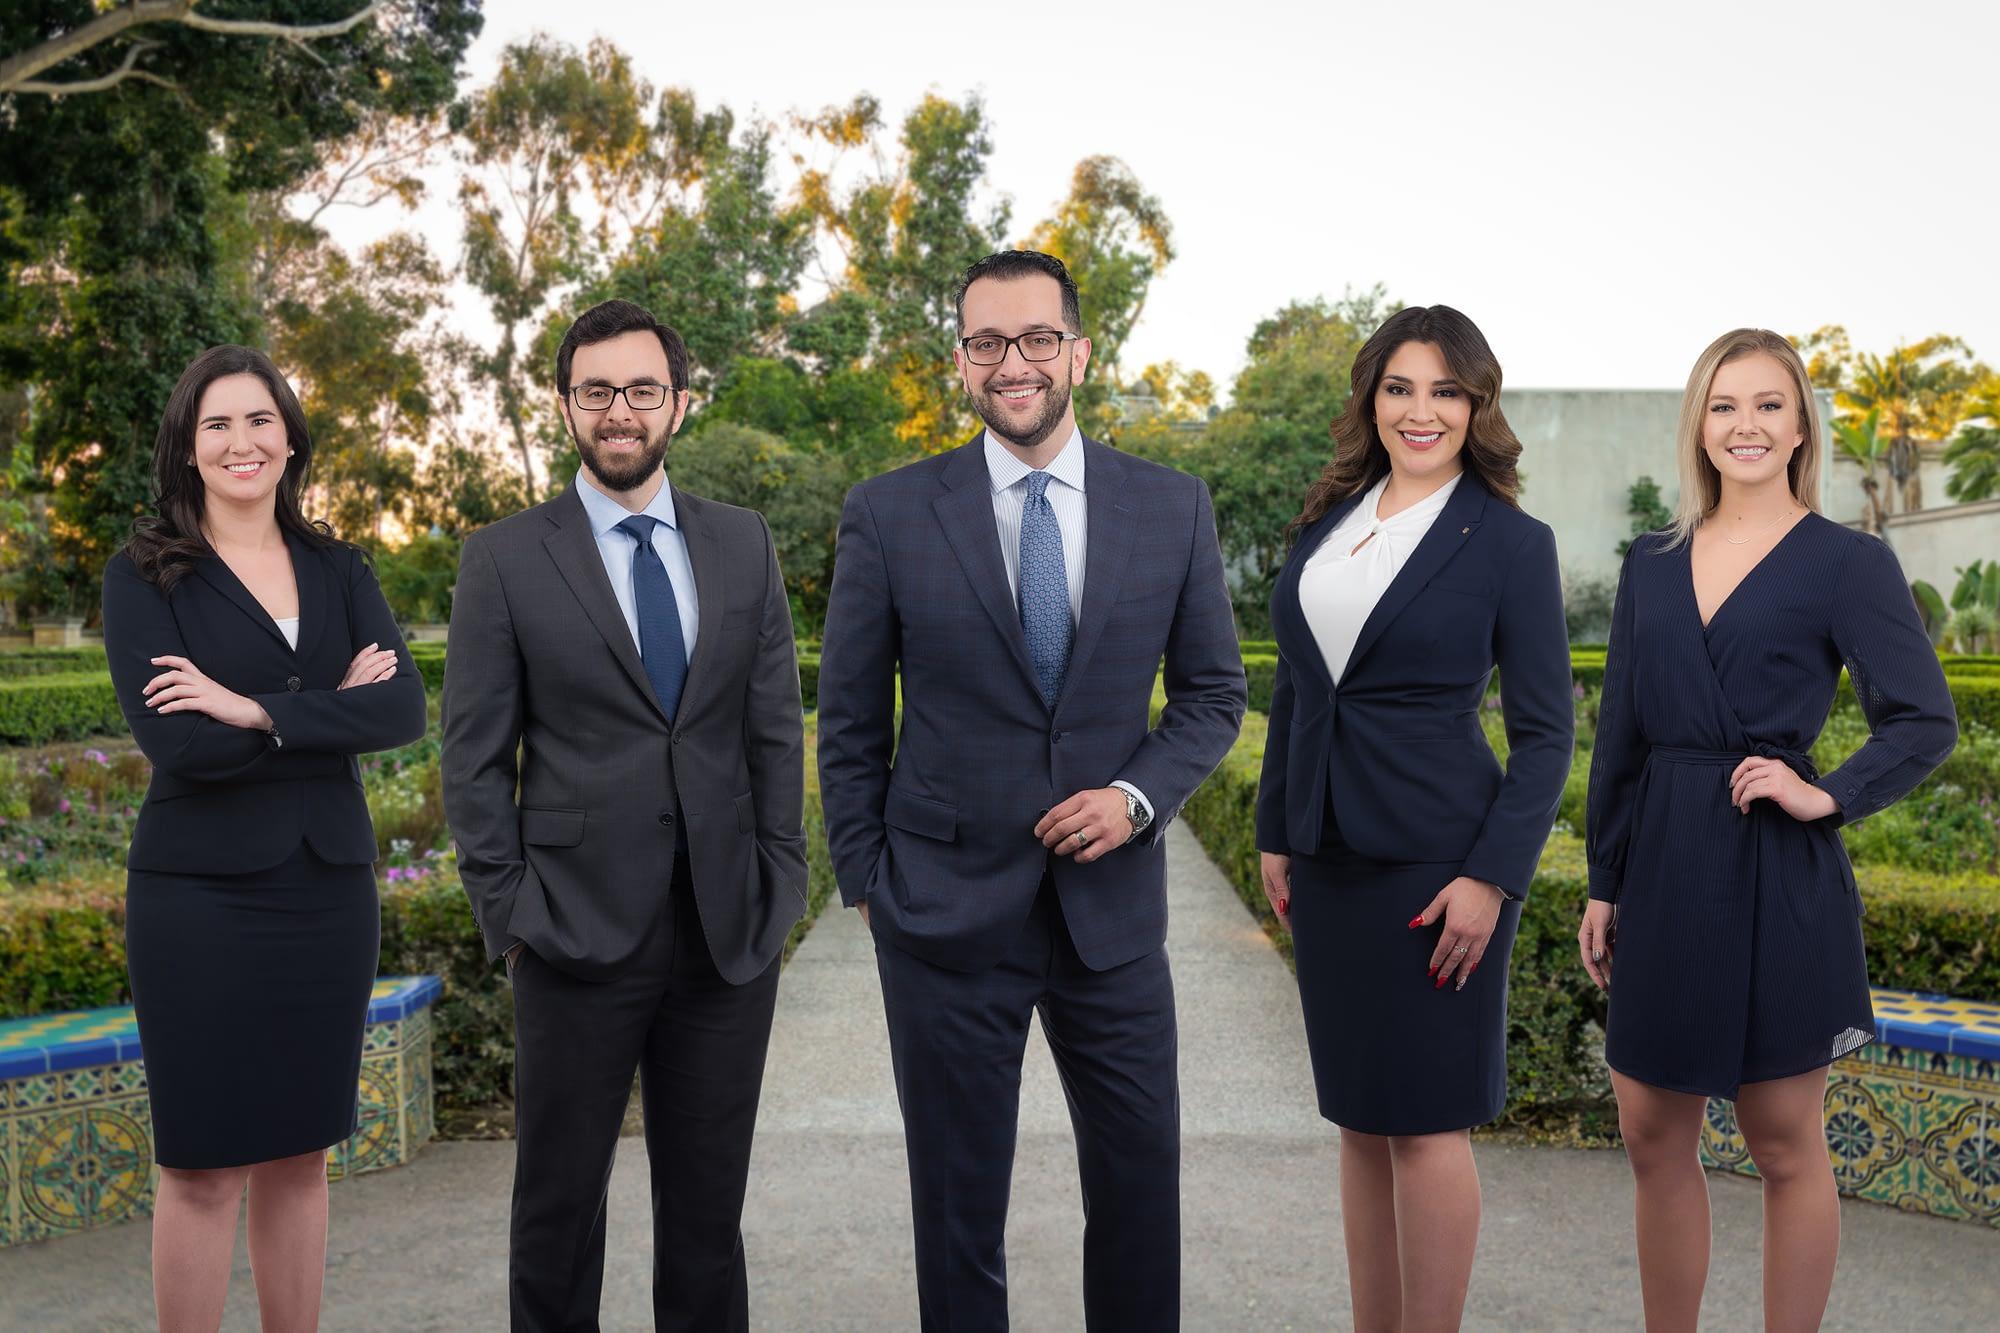 Criminal Defense Law Firm San Diego